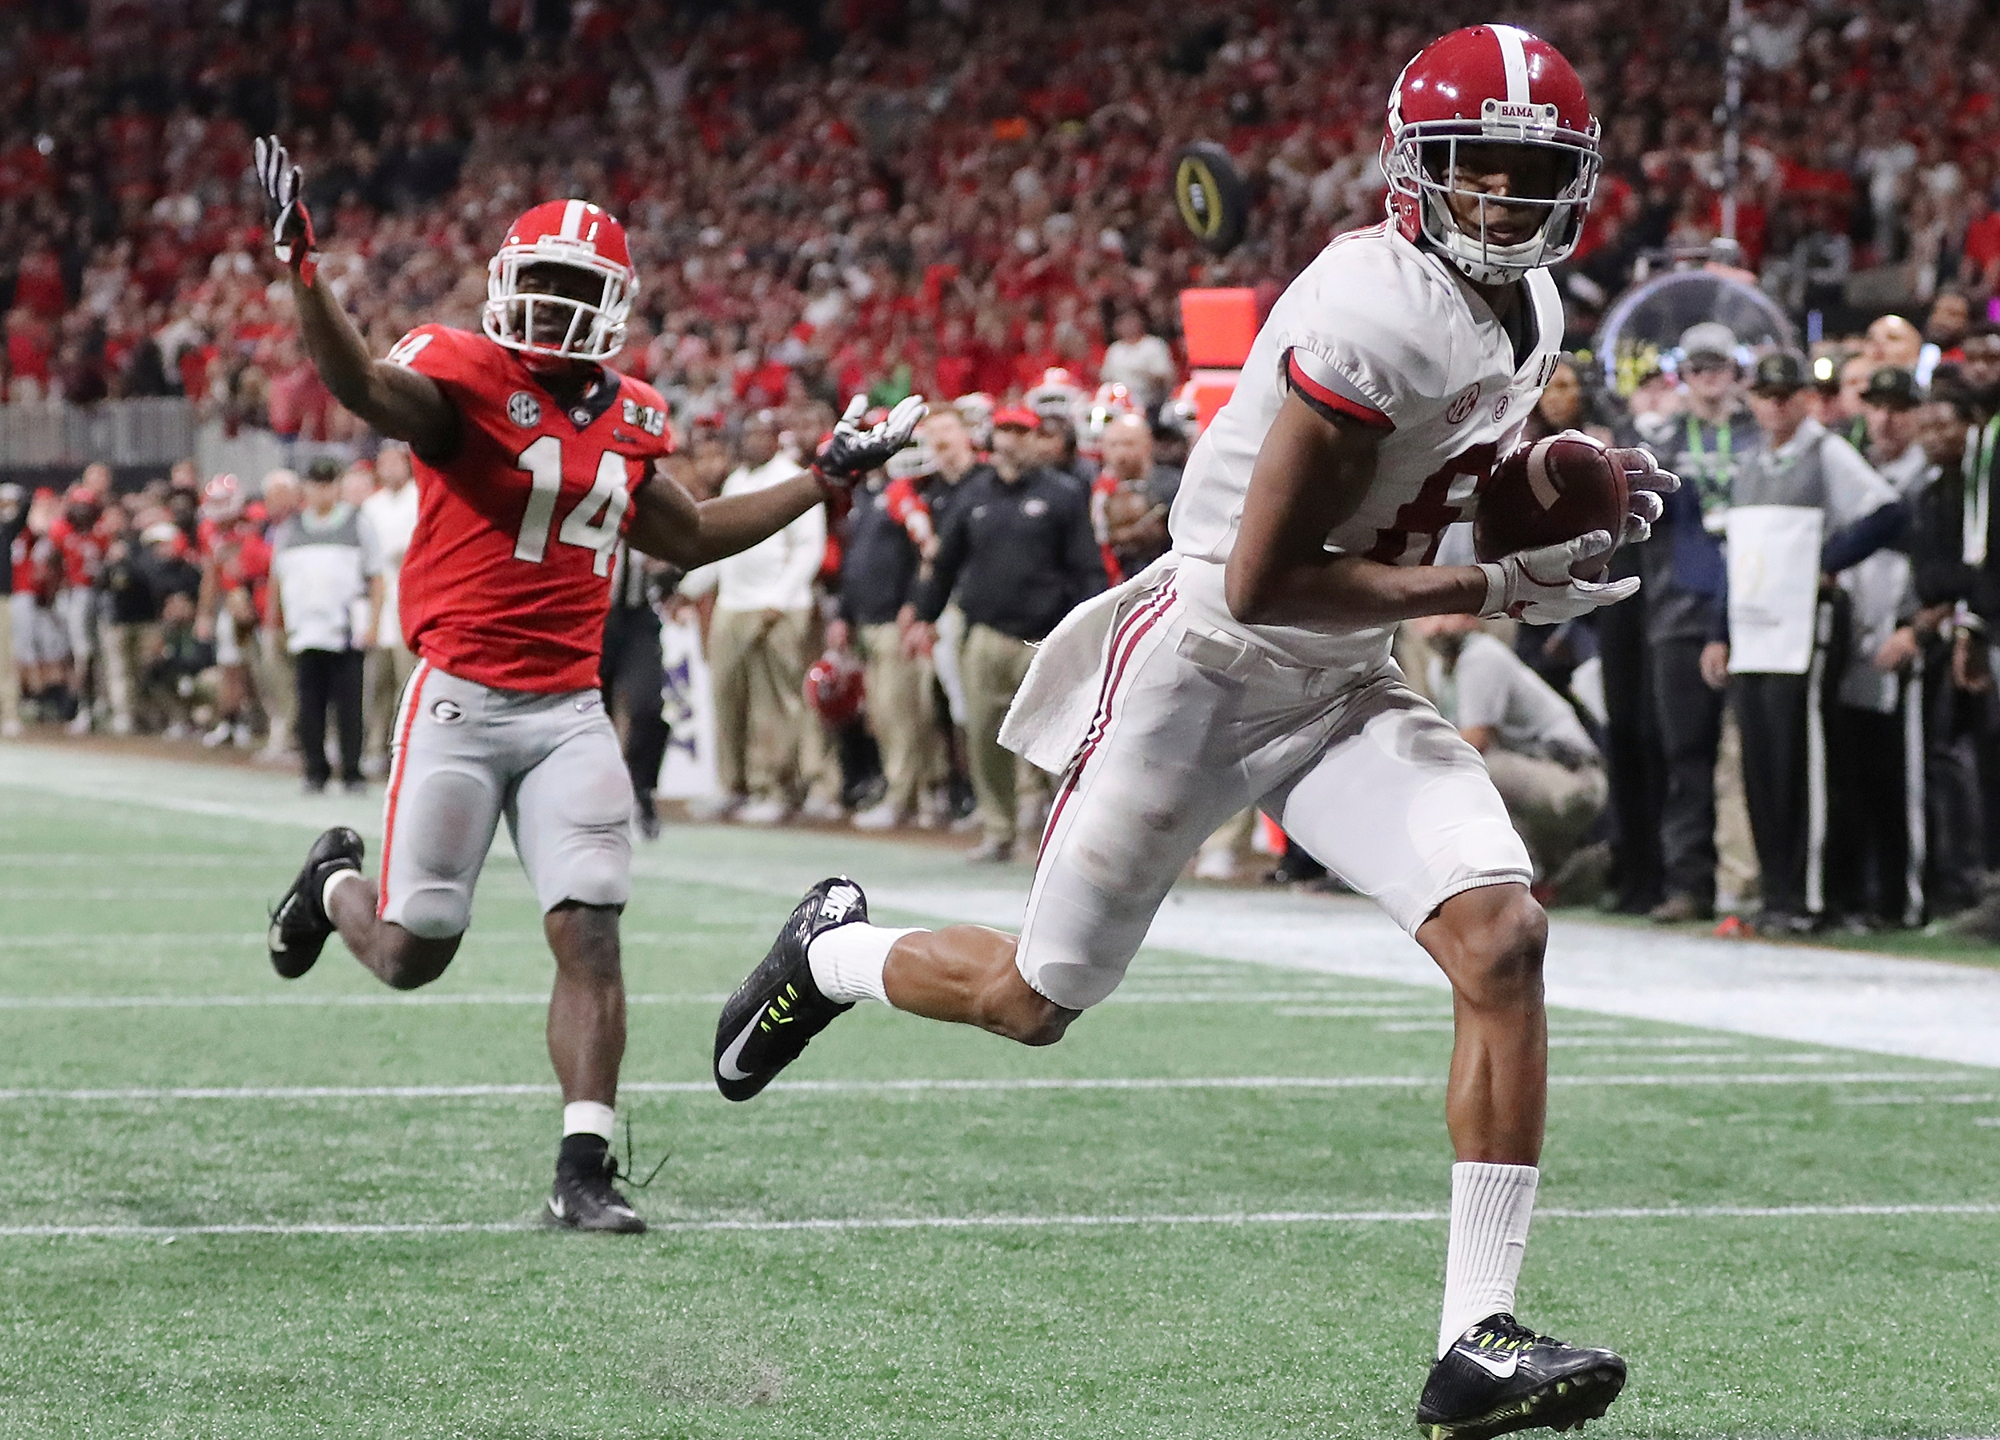 Playoff_Championship_Georgia_Alabama_Football_01395-159532.jpg08835836